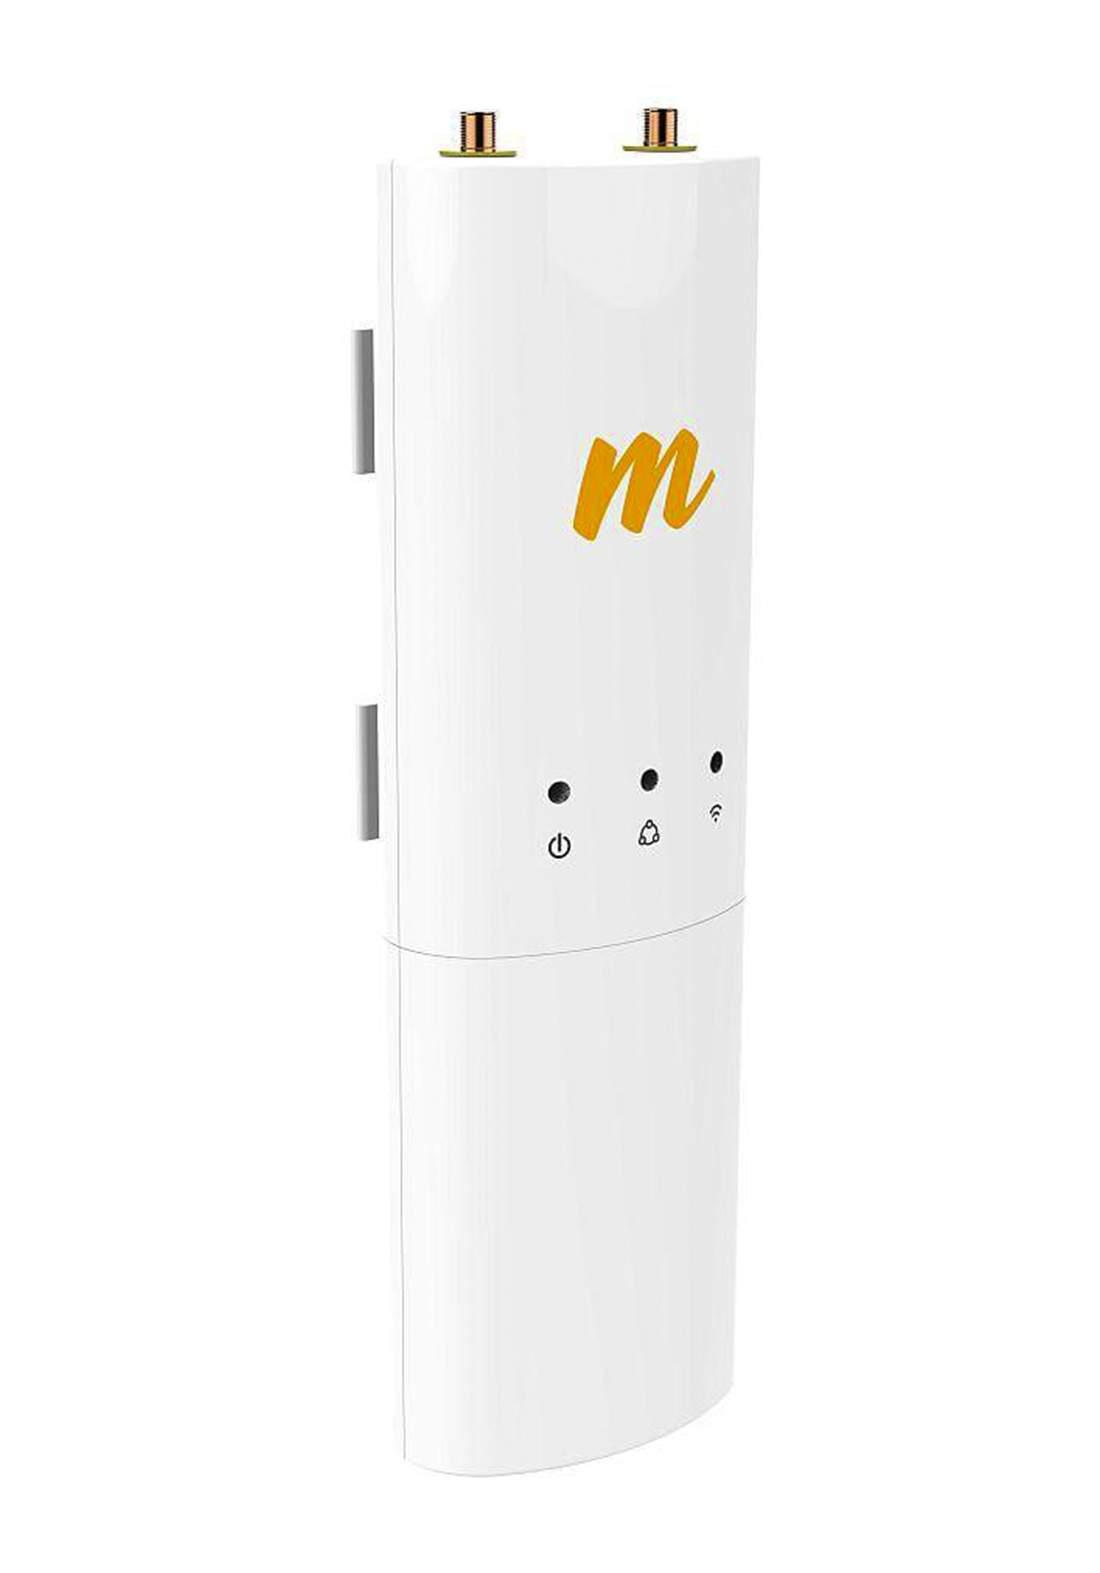 Mimosa C5c 56v Connectorized Long Range Client PoE - White